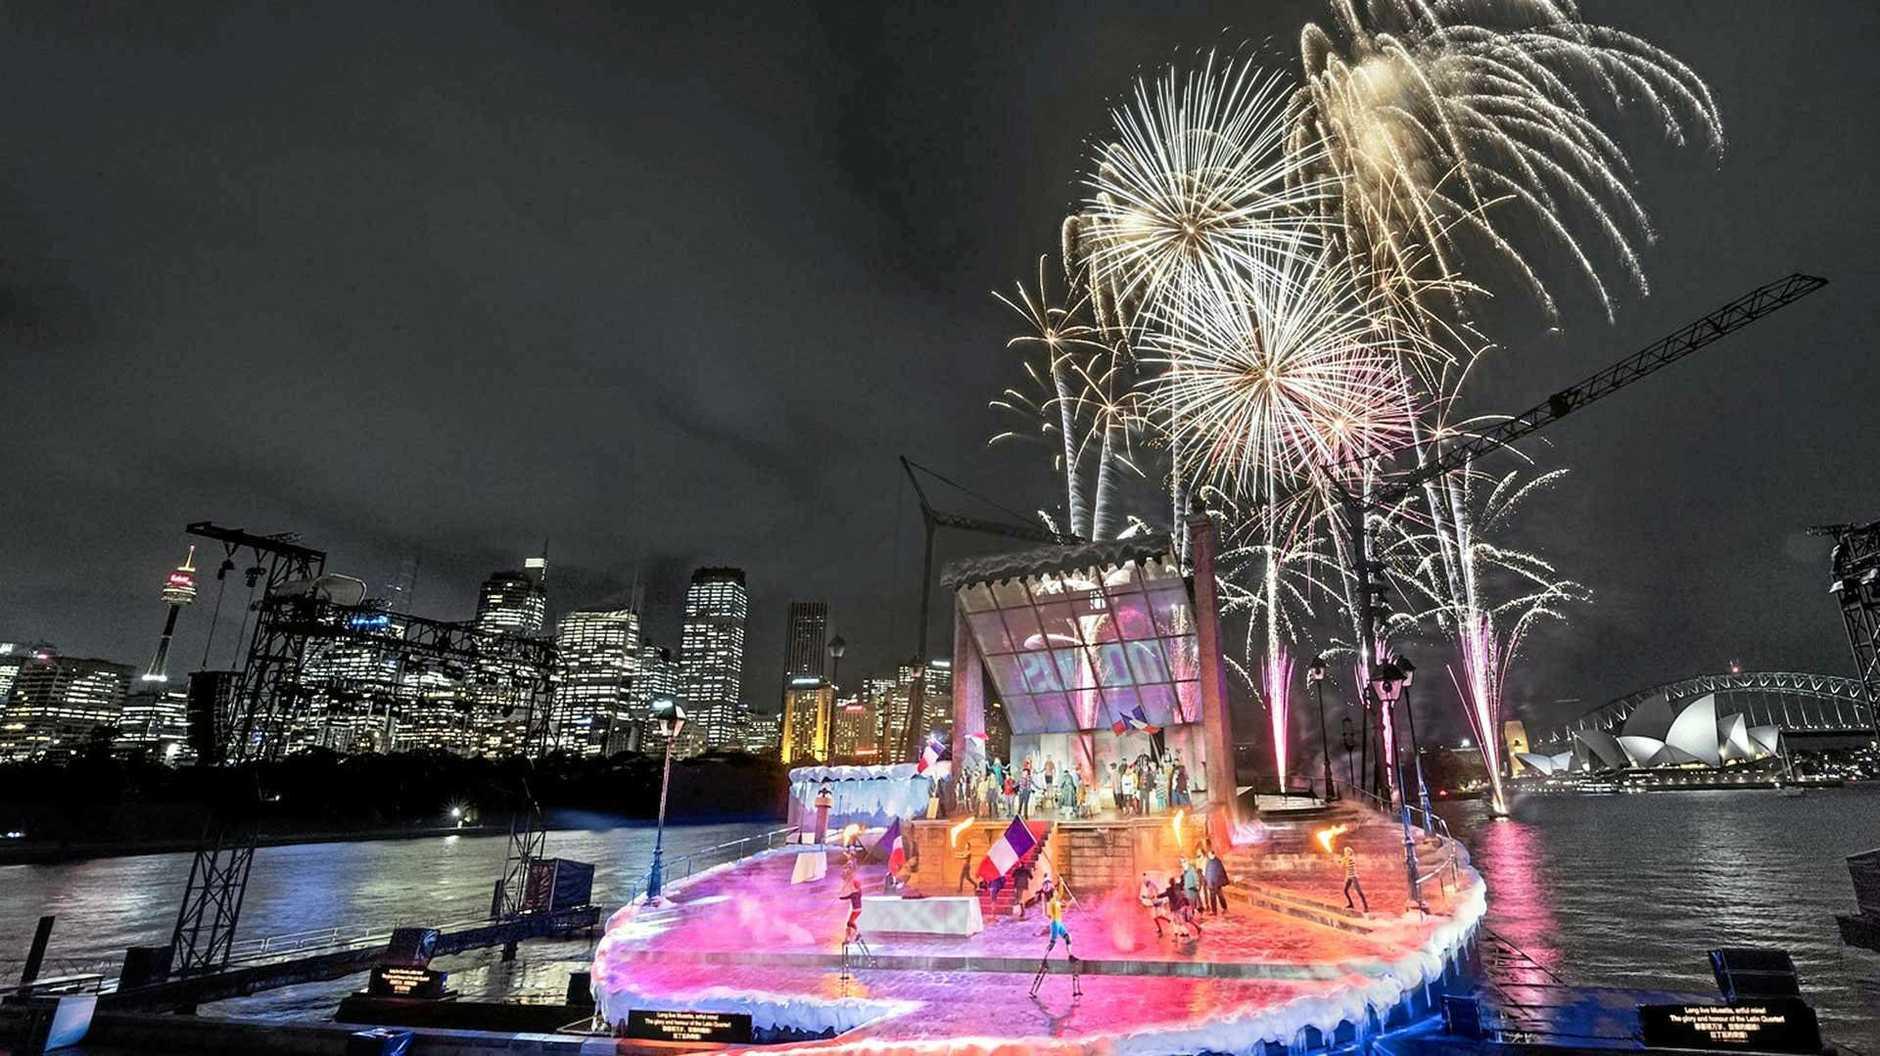 SPECIAL FILM EVENT:  La Boheme  on Sydney Harbour is coming to Majestic Cinemas, Nambour.